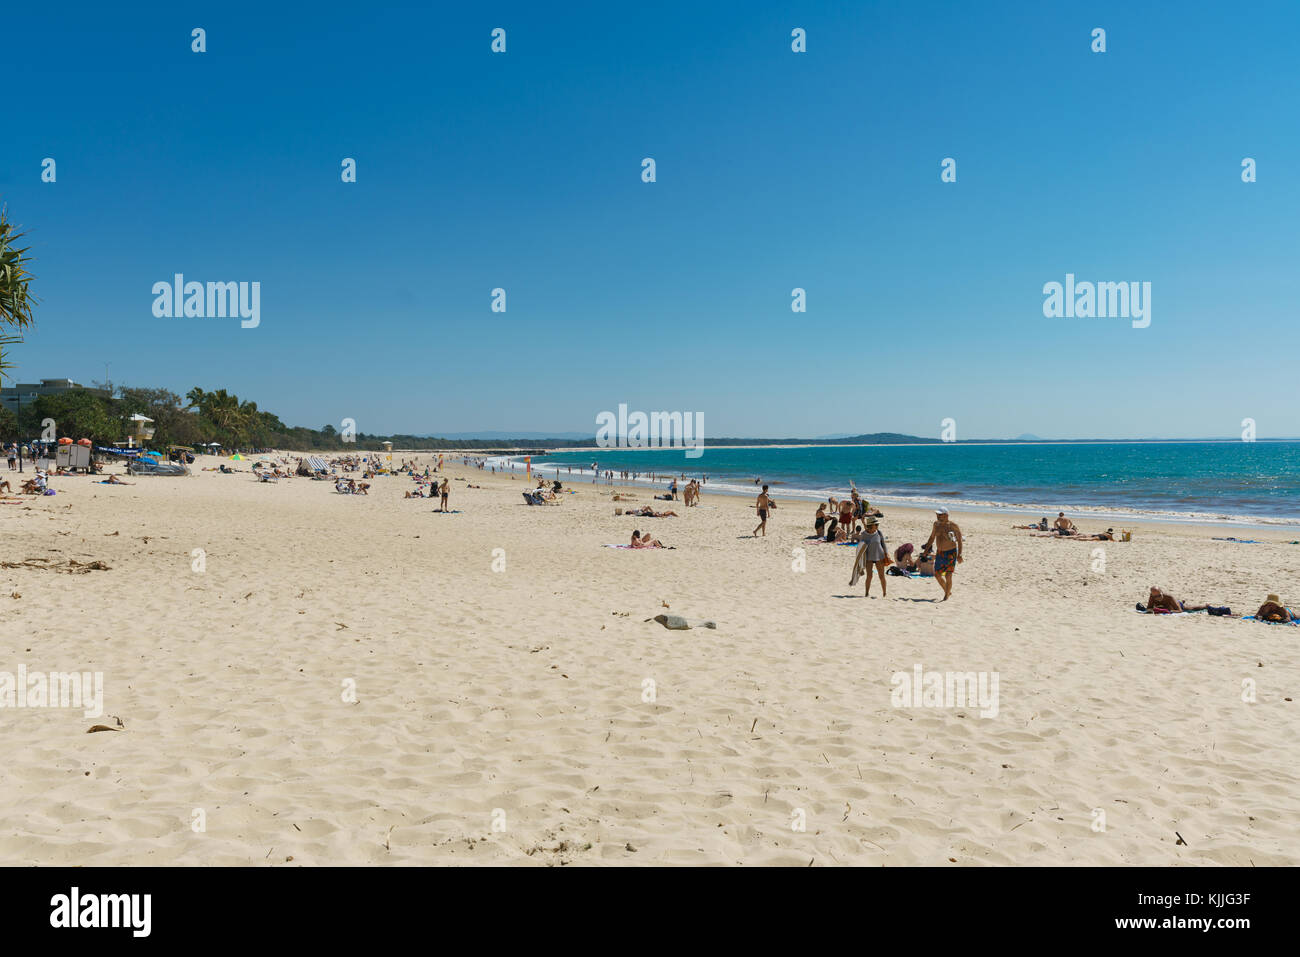 Noosa Head, Australia, Travel Lifestyle, Beaches, Birds, Flowers, blue sky - Stock Image